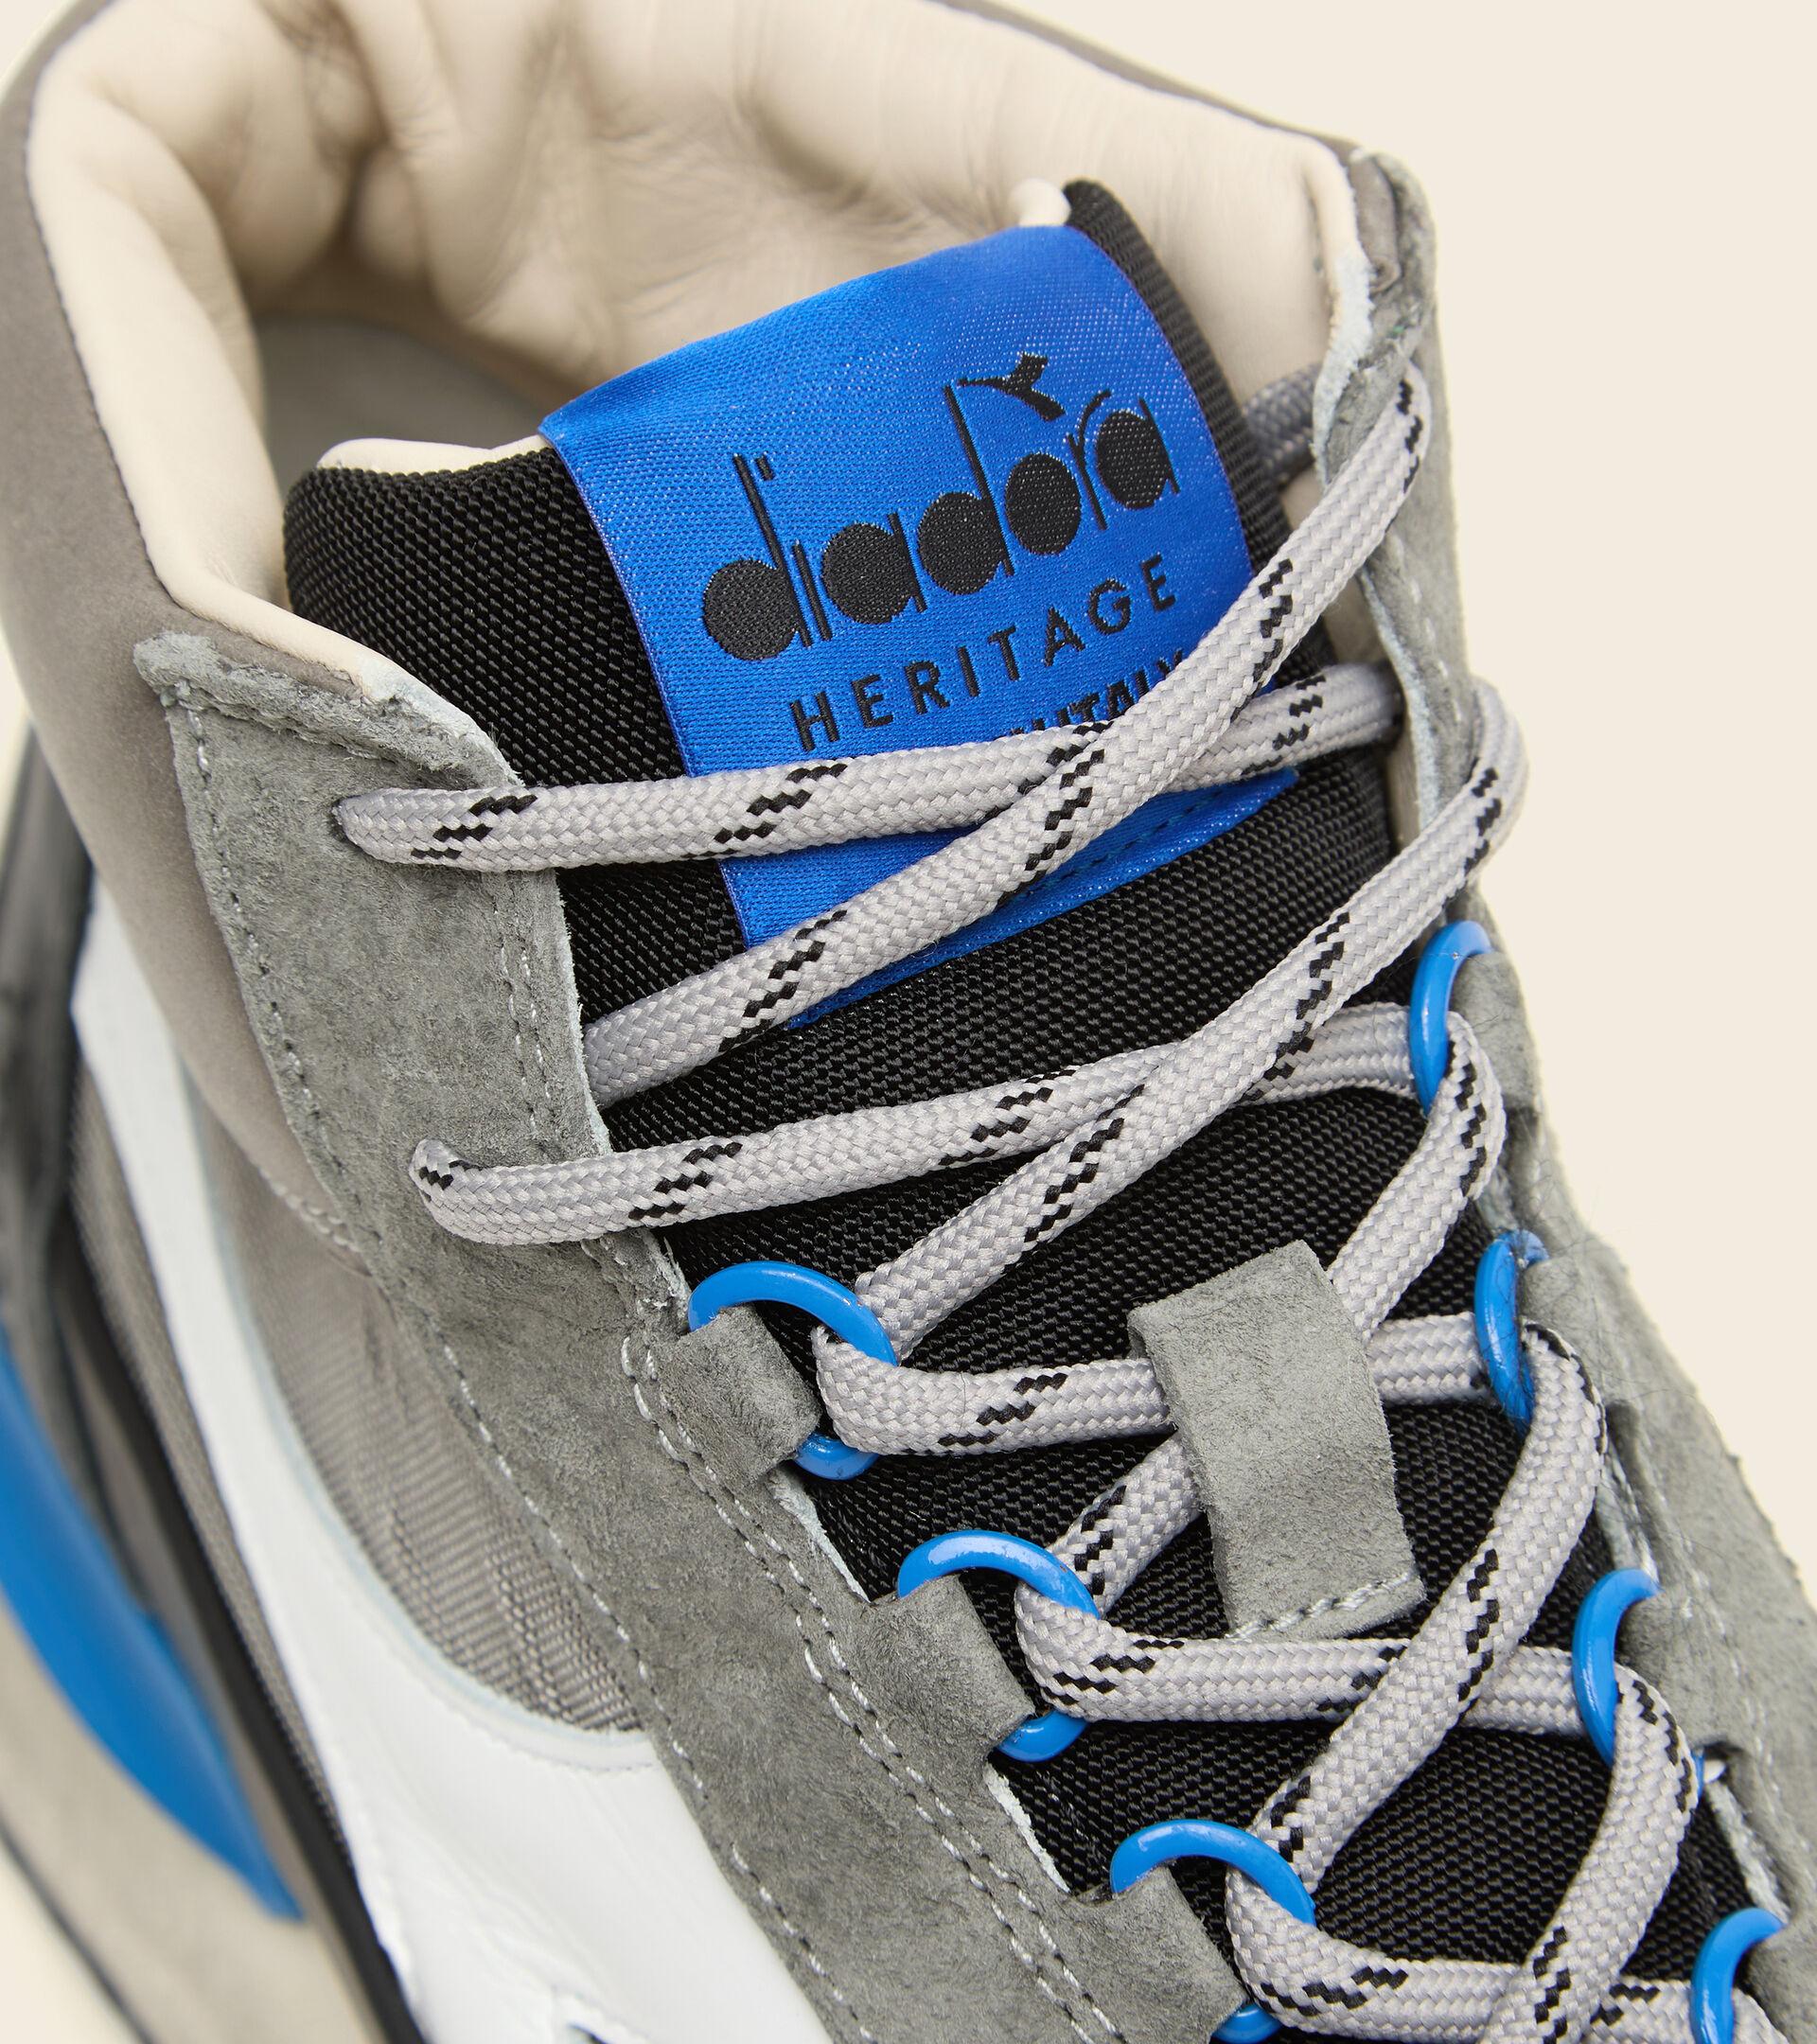 Footwear Heritage UNISEX EQUIPE MID MAD ITALIA NUBUCK SW ASH GREY Diadora